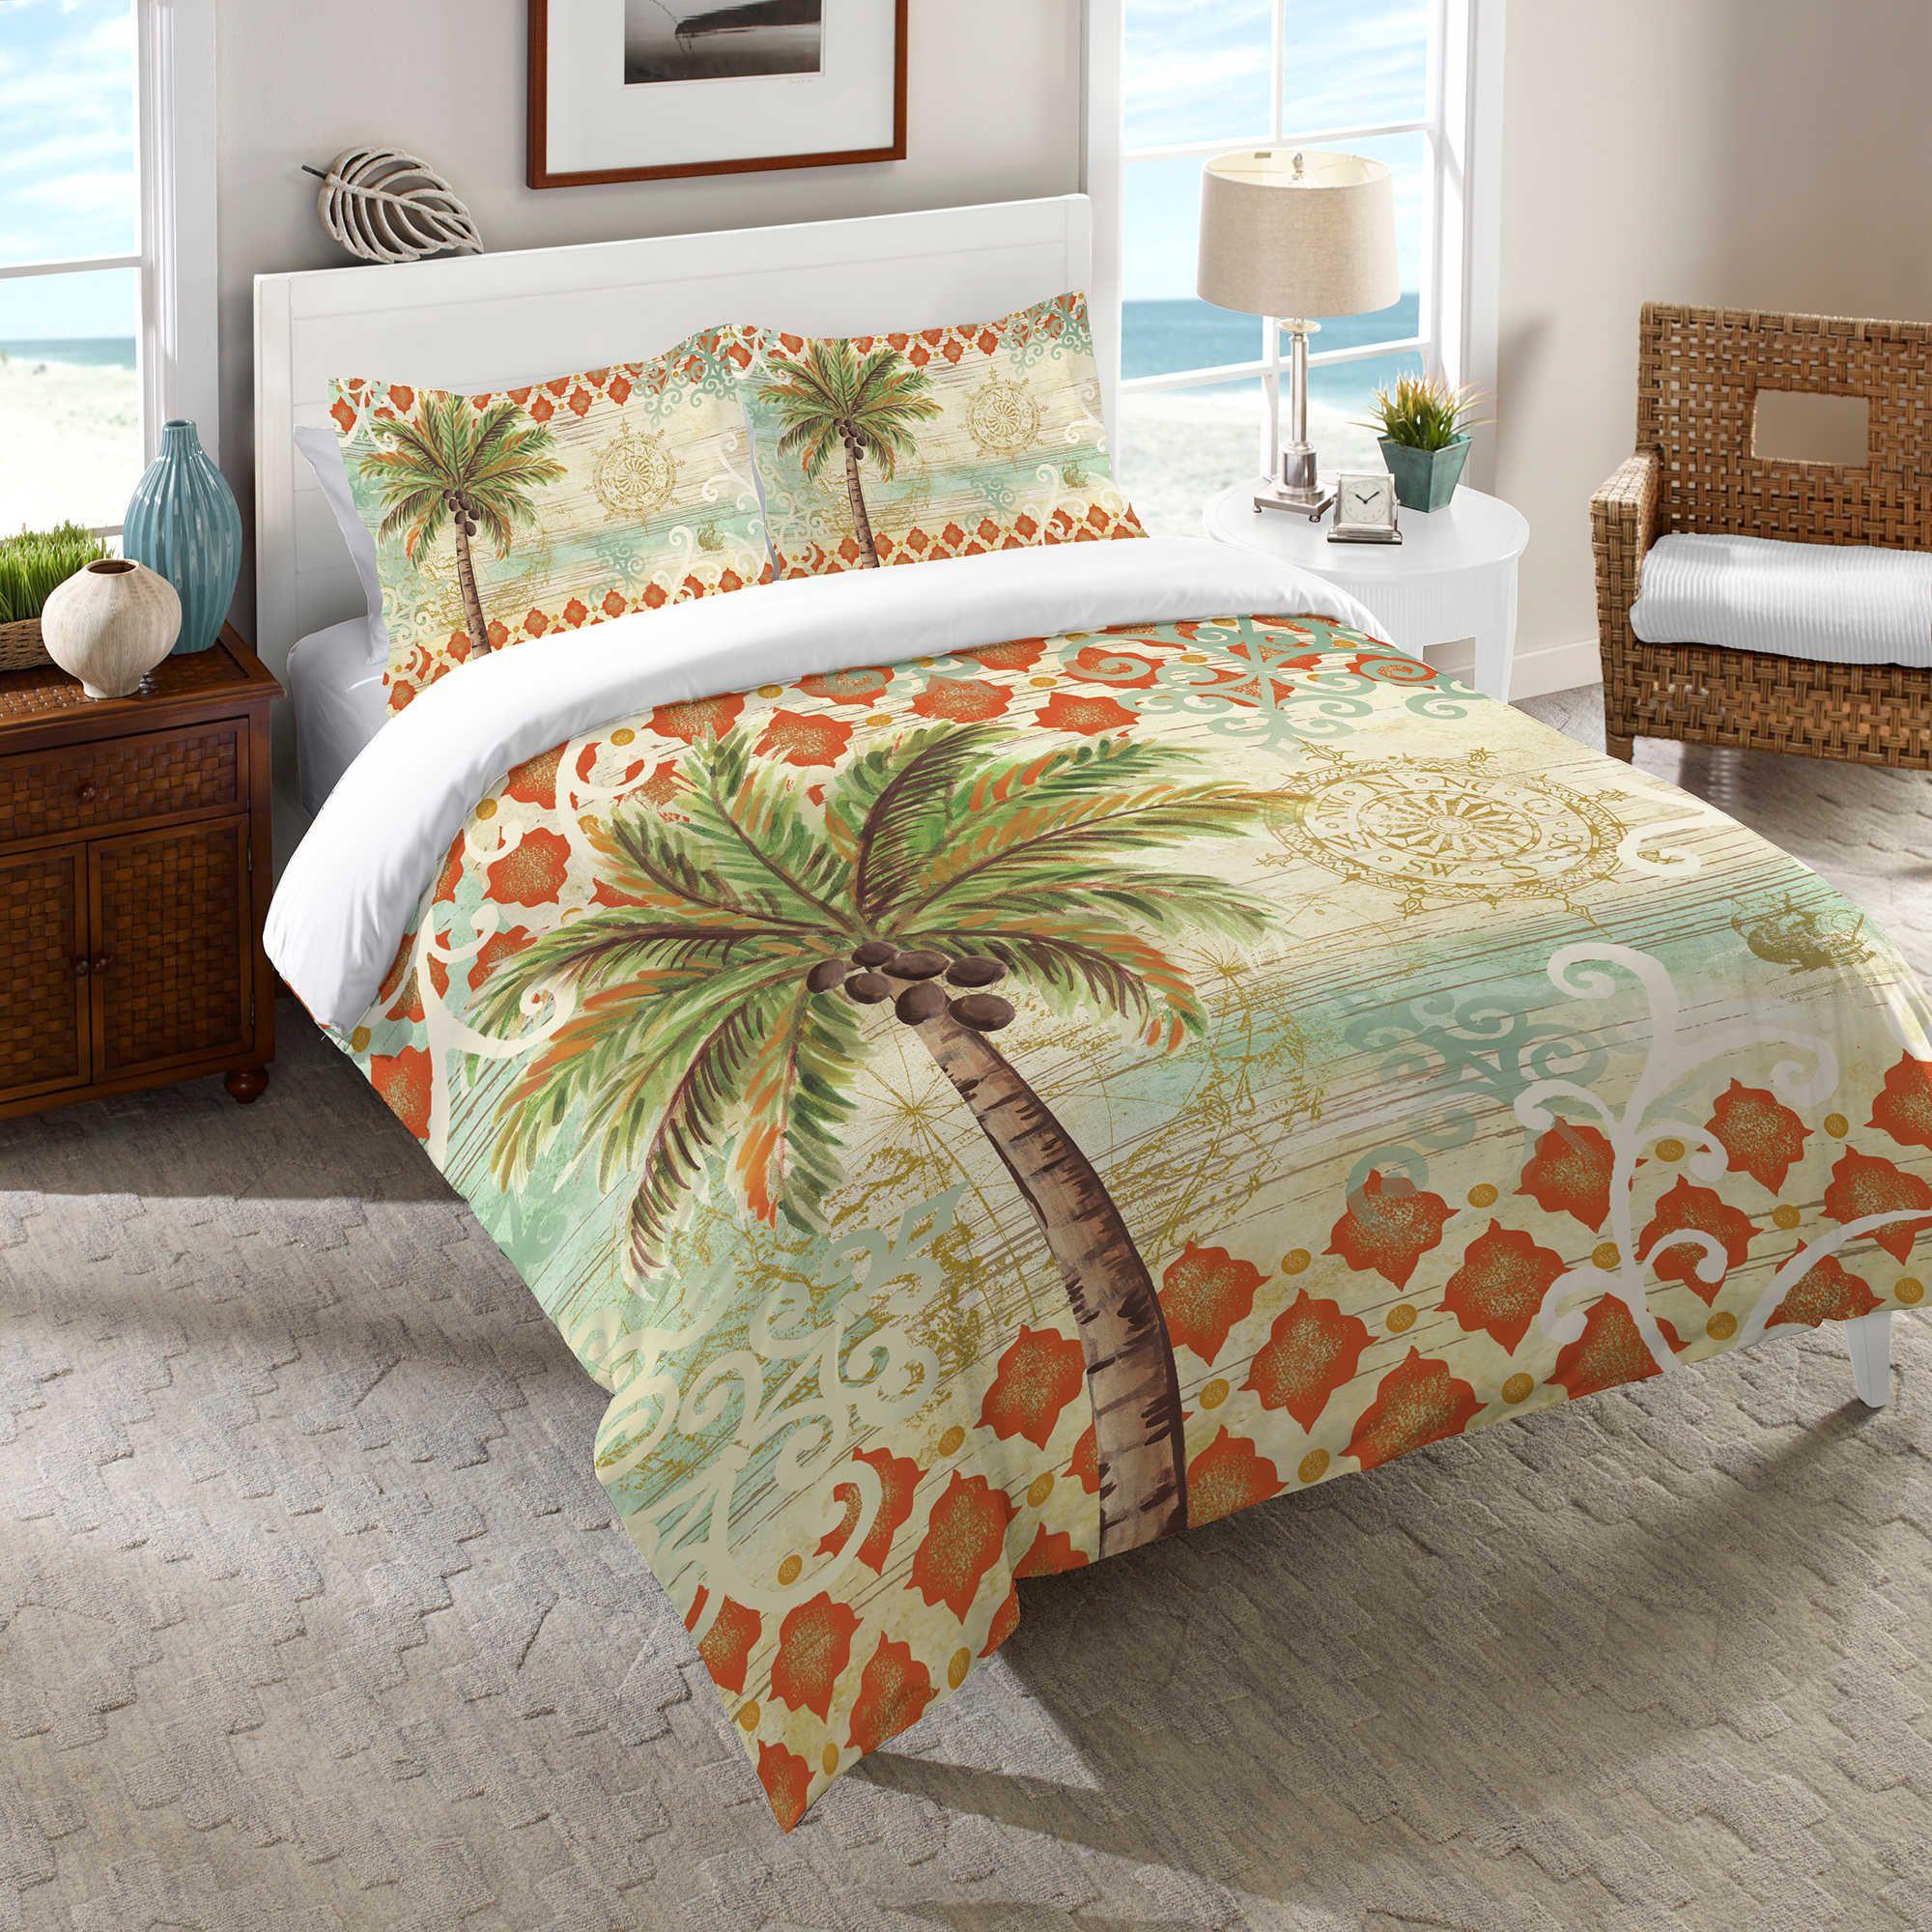 bridge street bedding set sets coastal pinterest bed chatham comforter home ideas pin